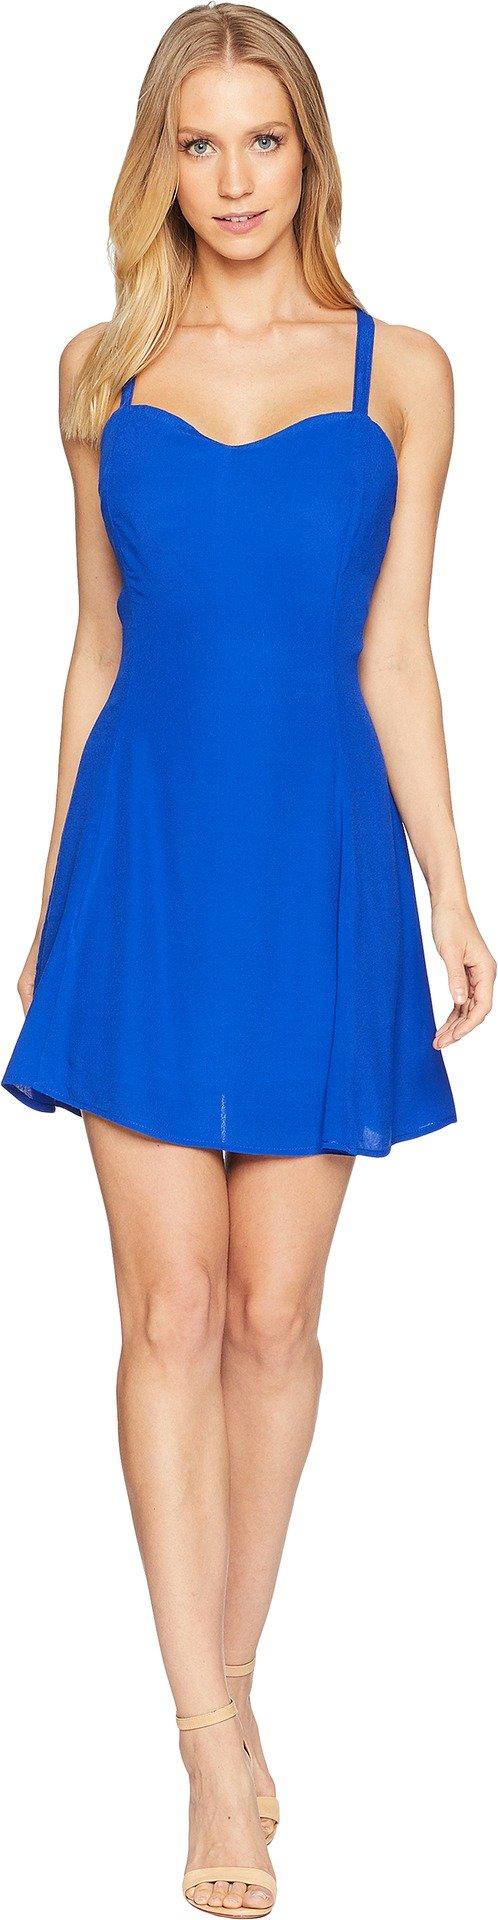 Lucy Love Women's The Rachel Slip Dress Royal Blue Small